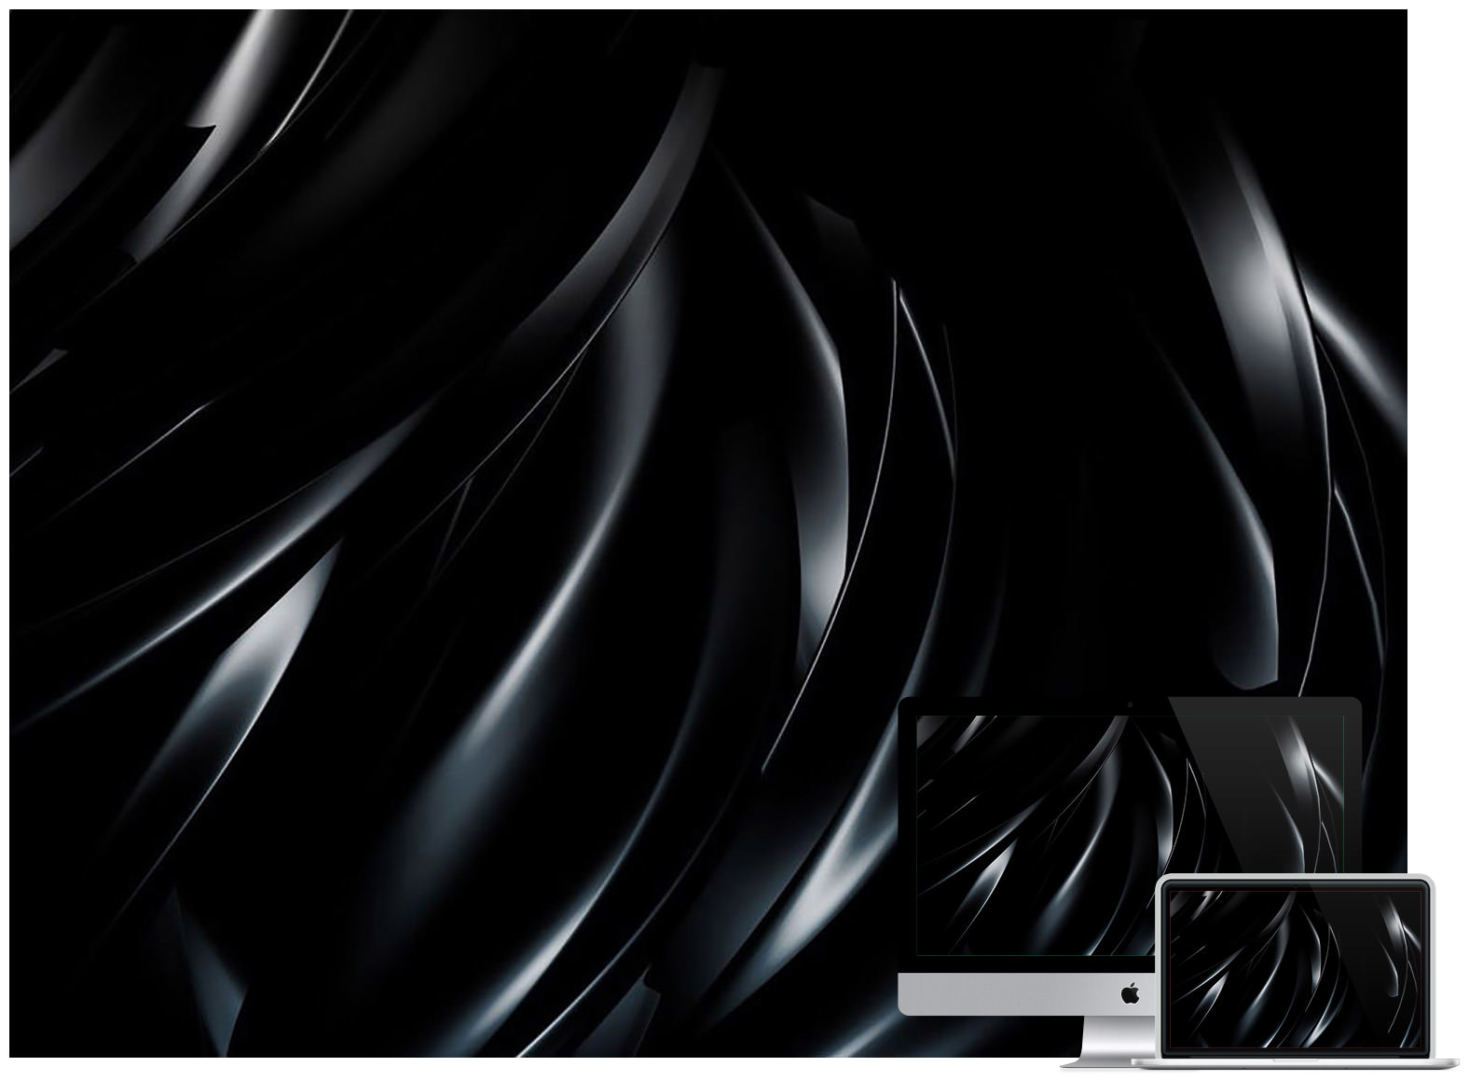 ink-black-wallpaper-wallpaper